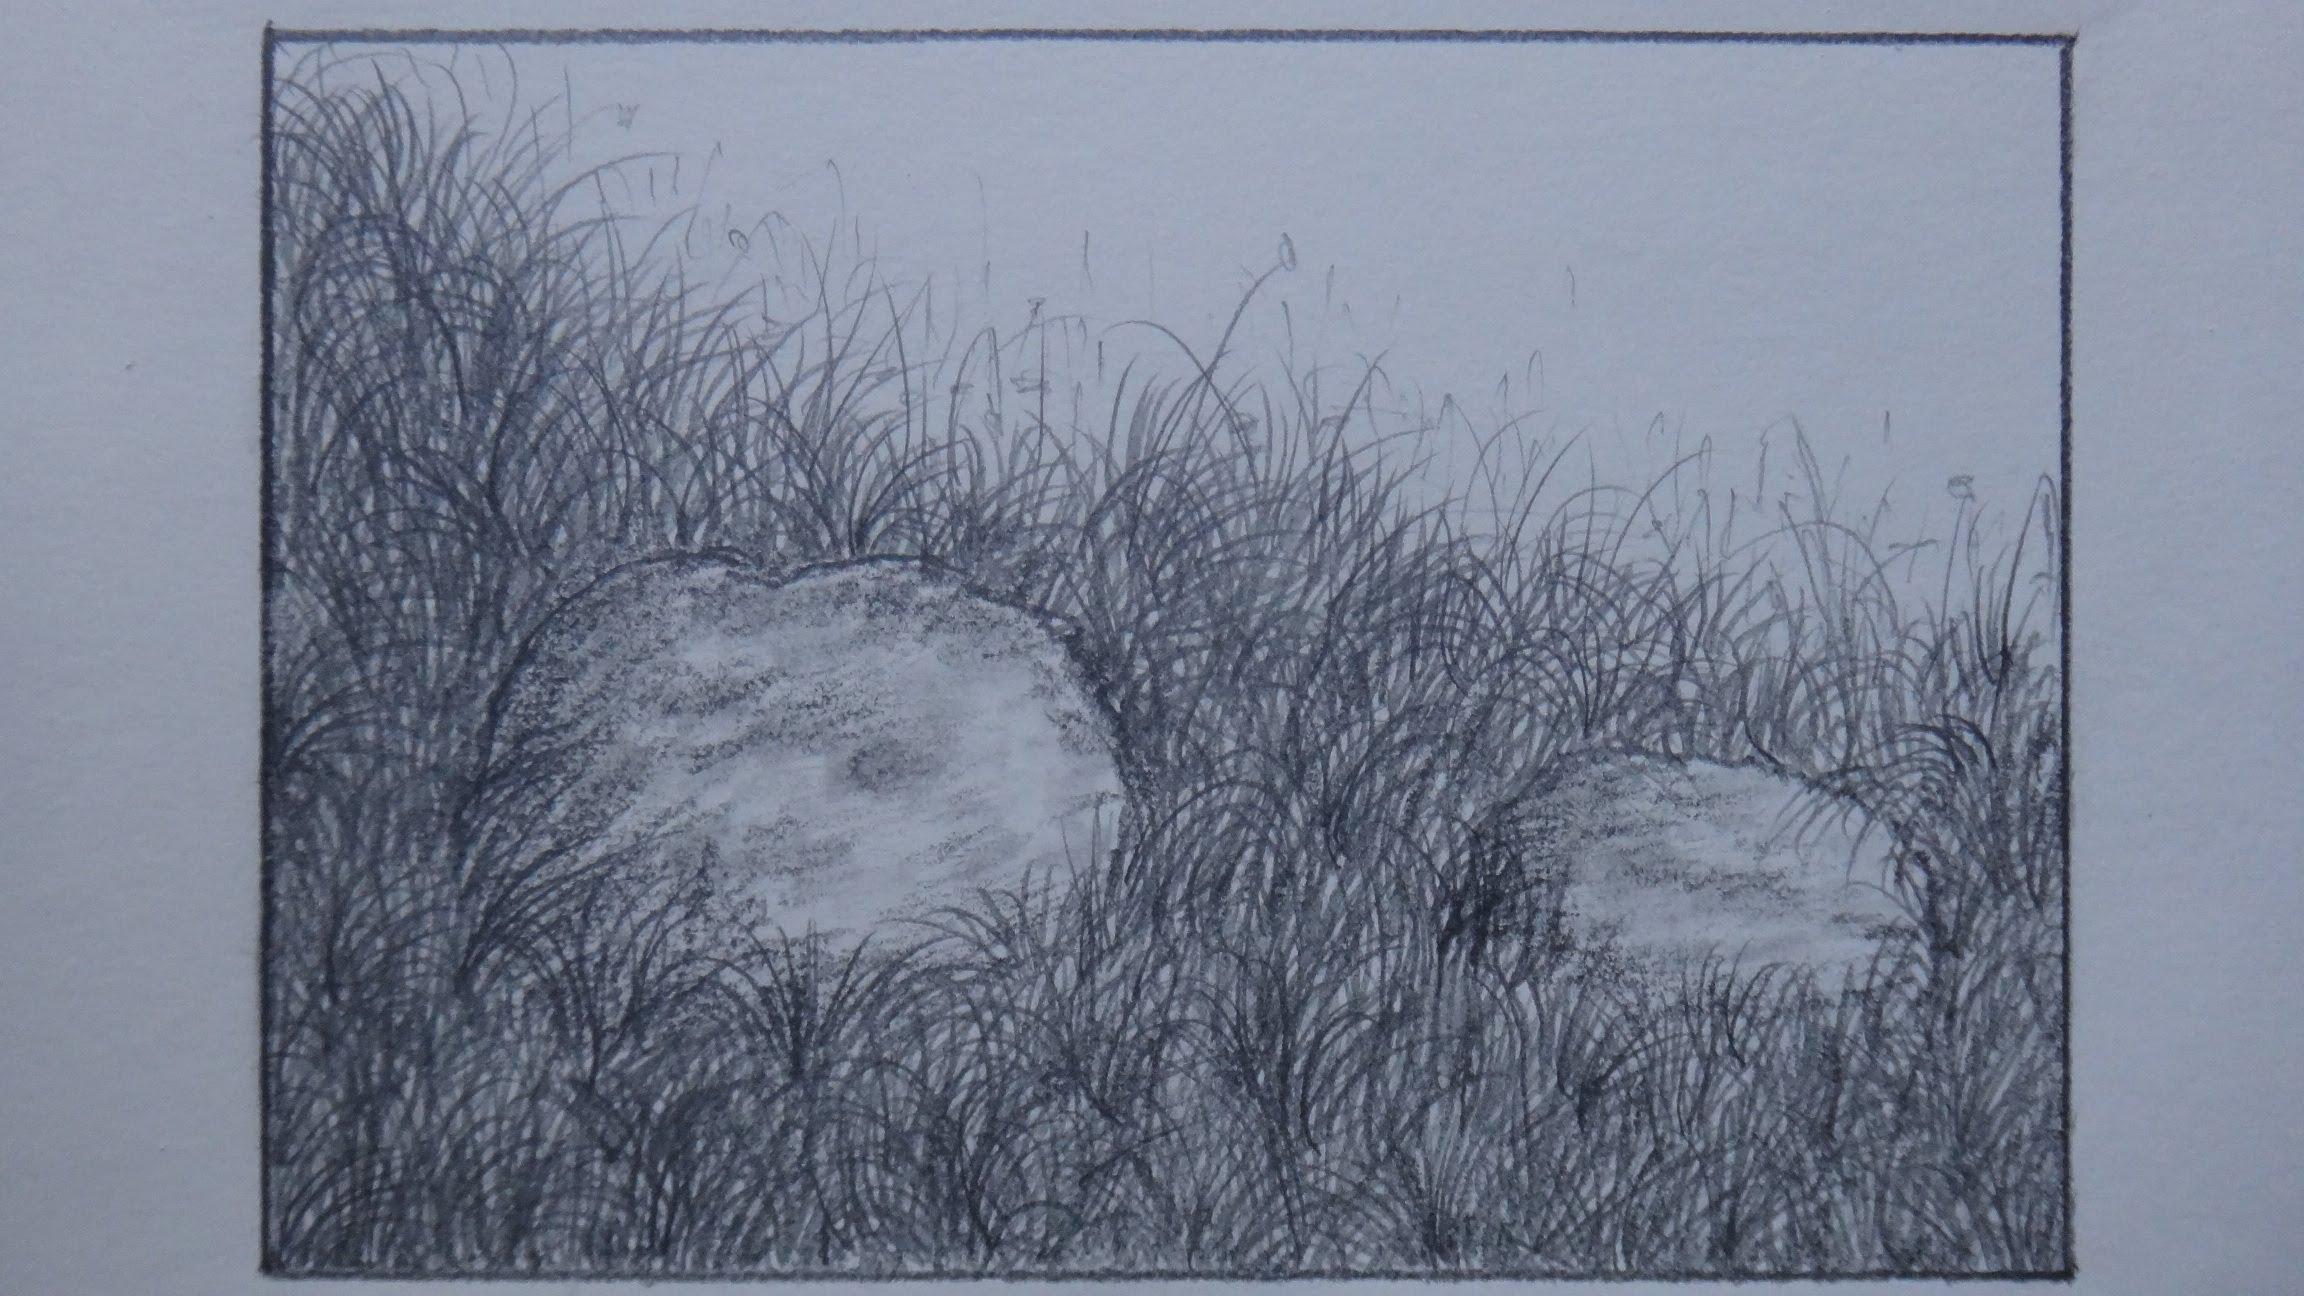 Drawn lawn Using  to draw grass